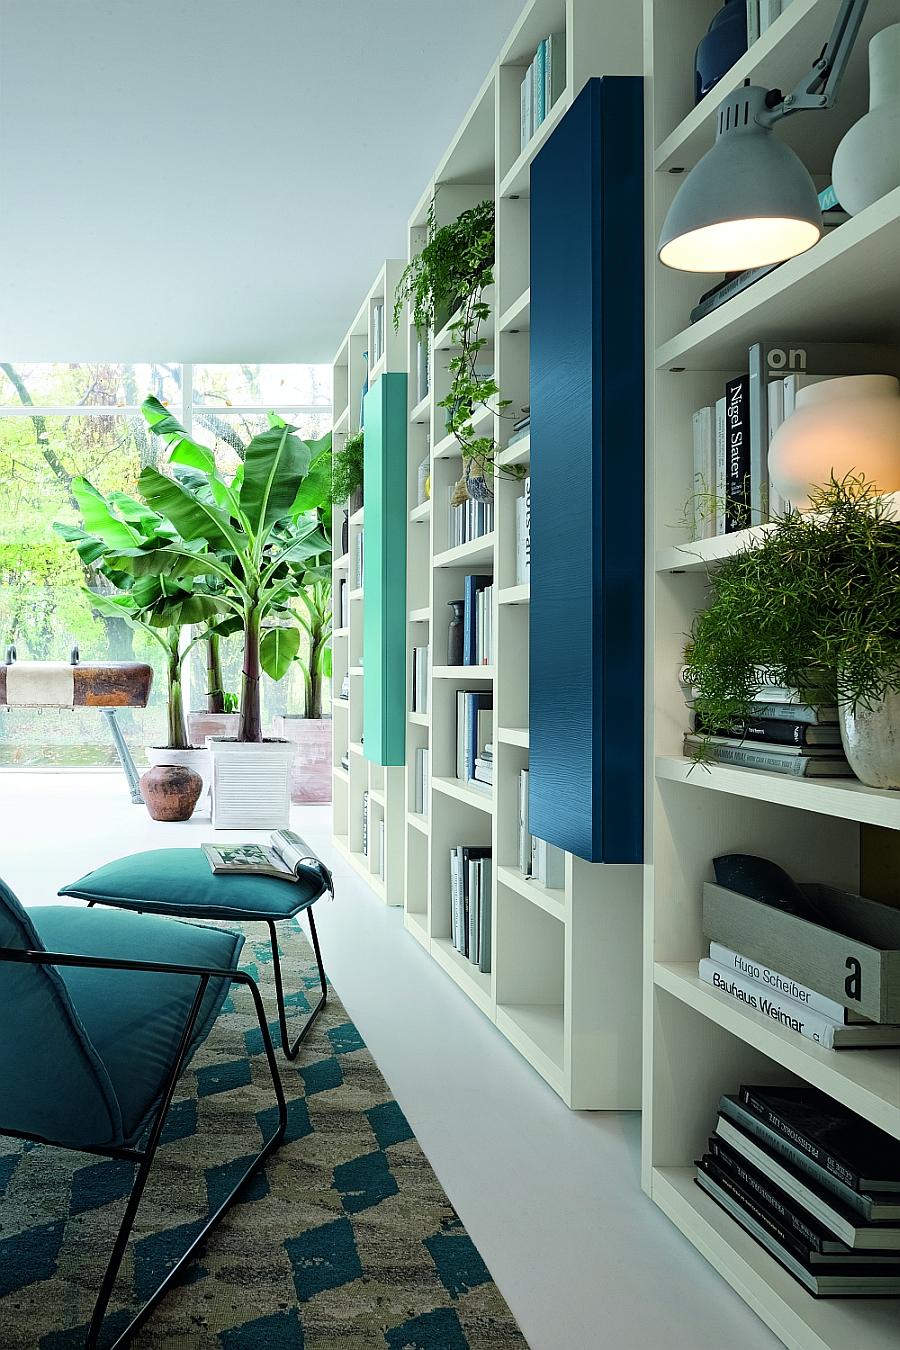 Modern Modular Wall Units For Living Room on Wall Units For Living Room Contemporary id=99252